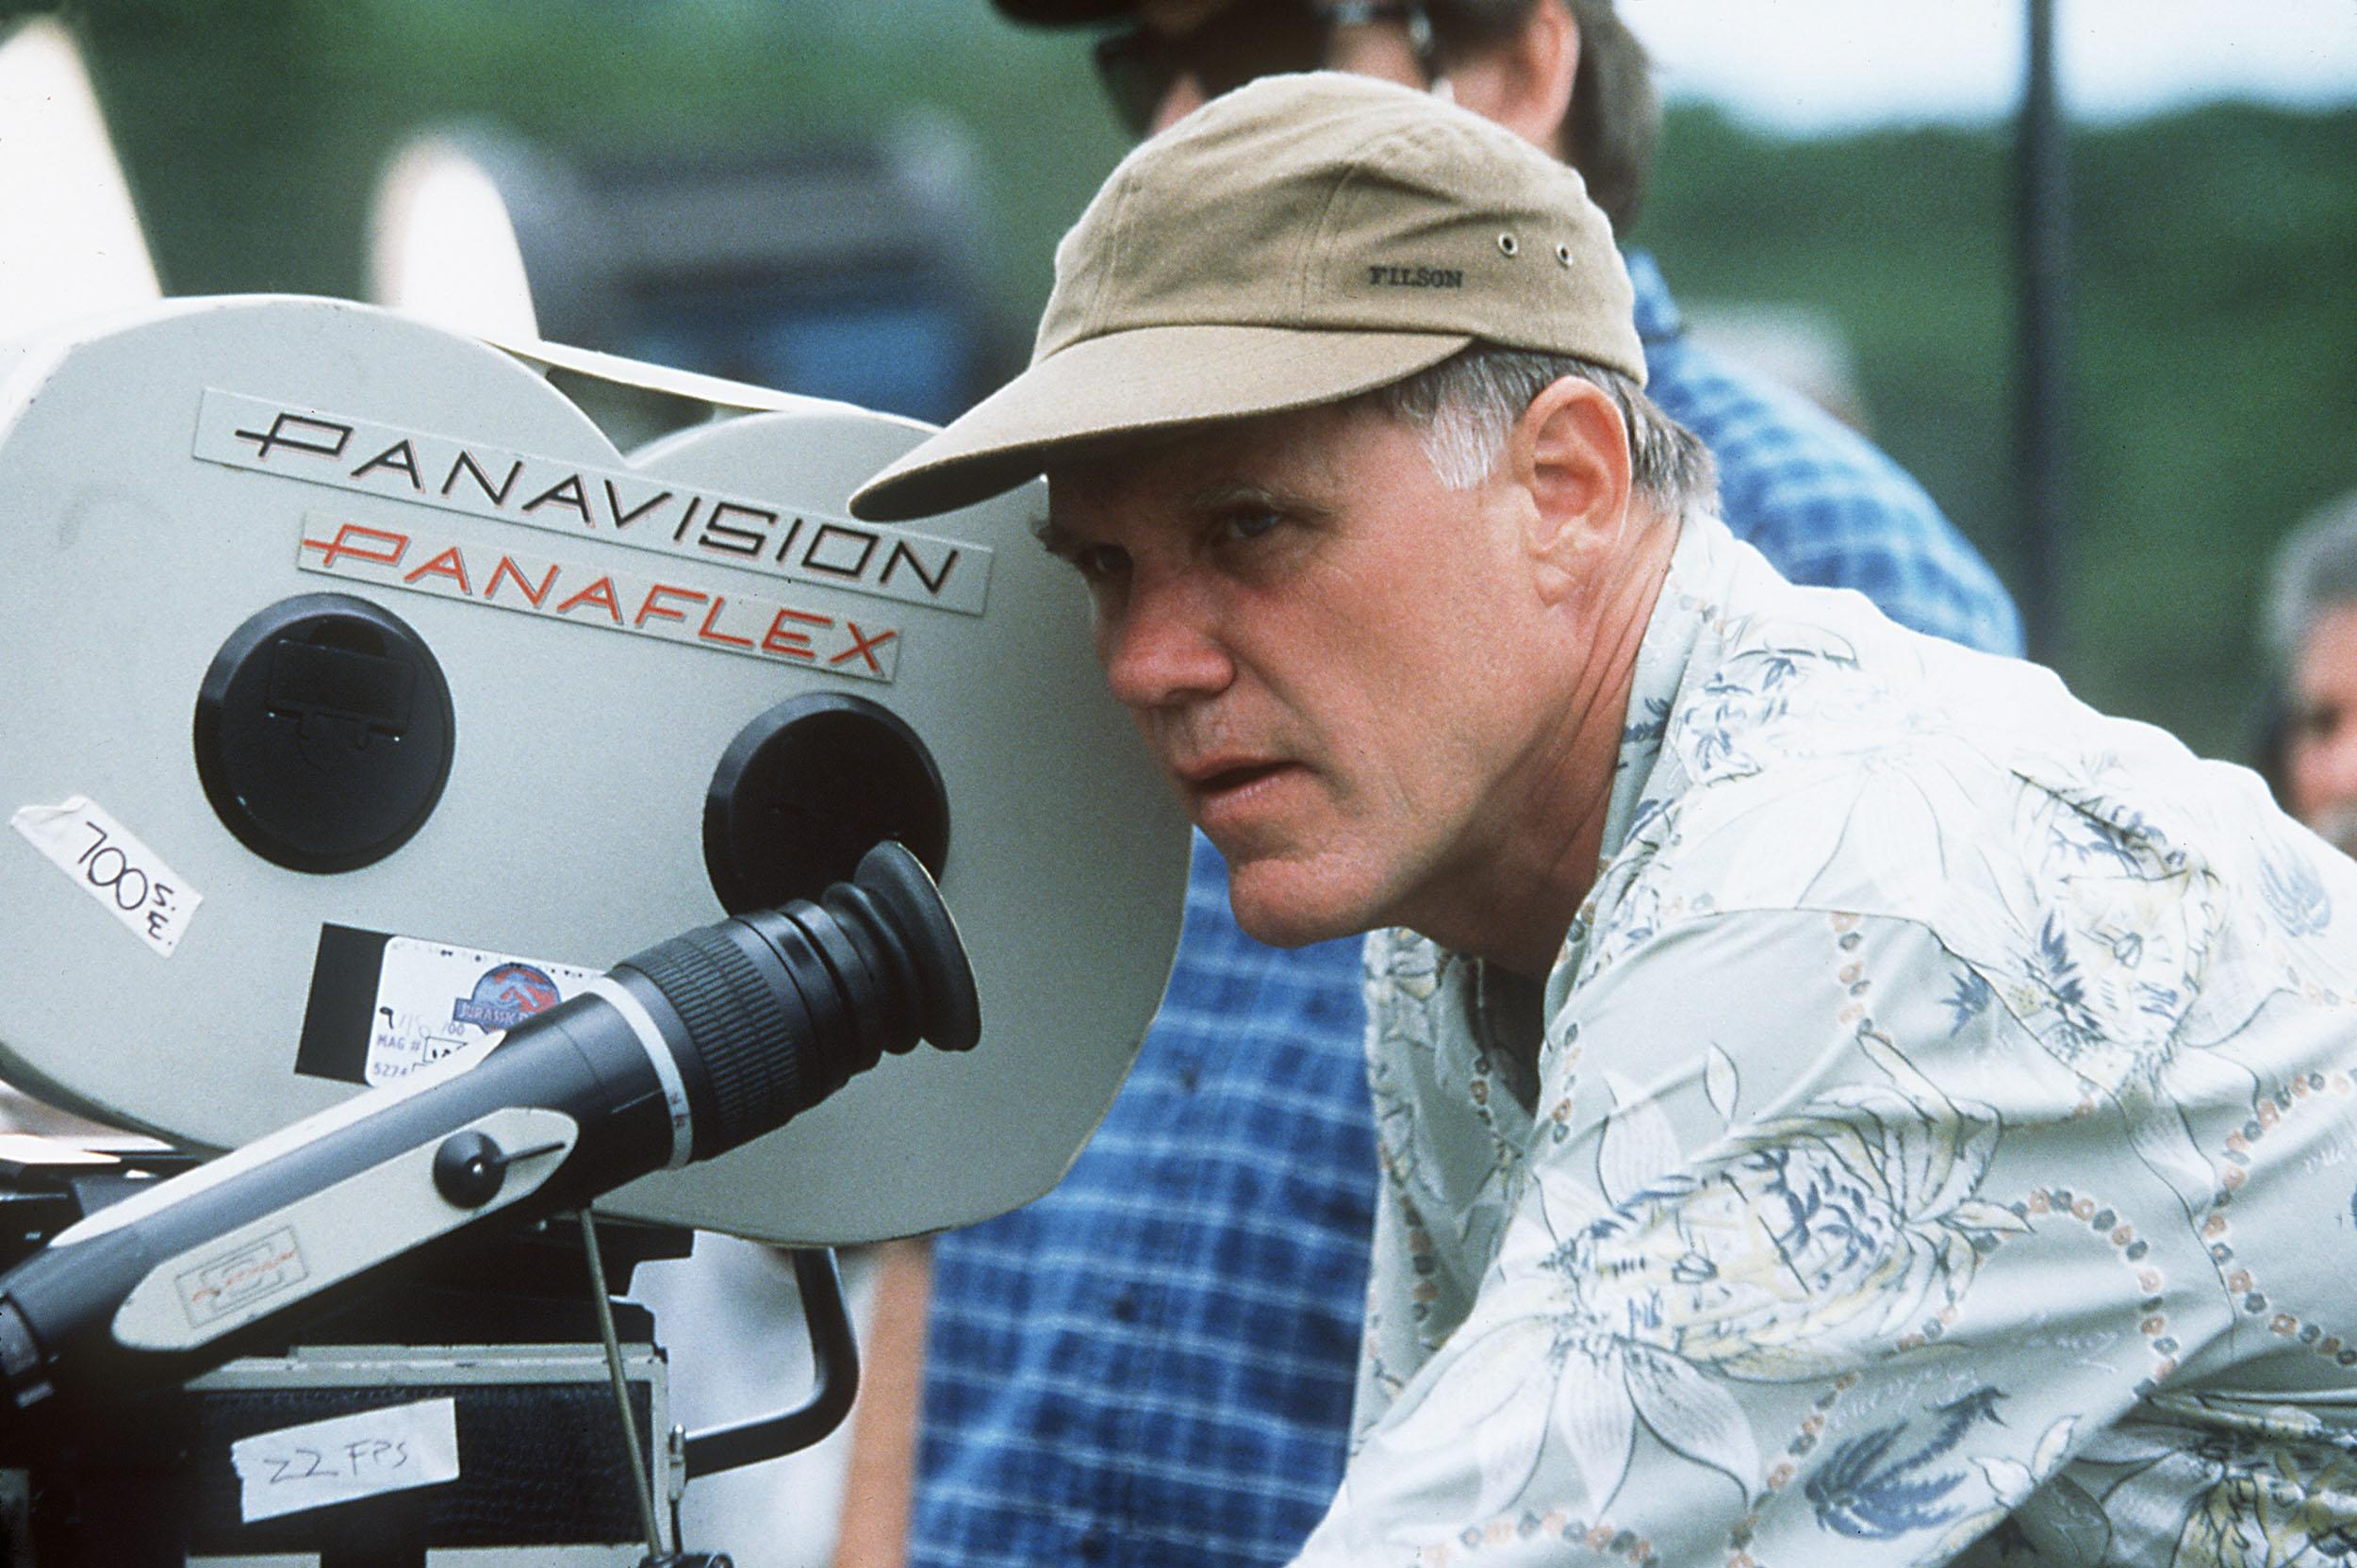 Director Joe Johnston Narnia The Silver Chair final film